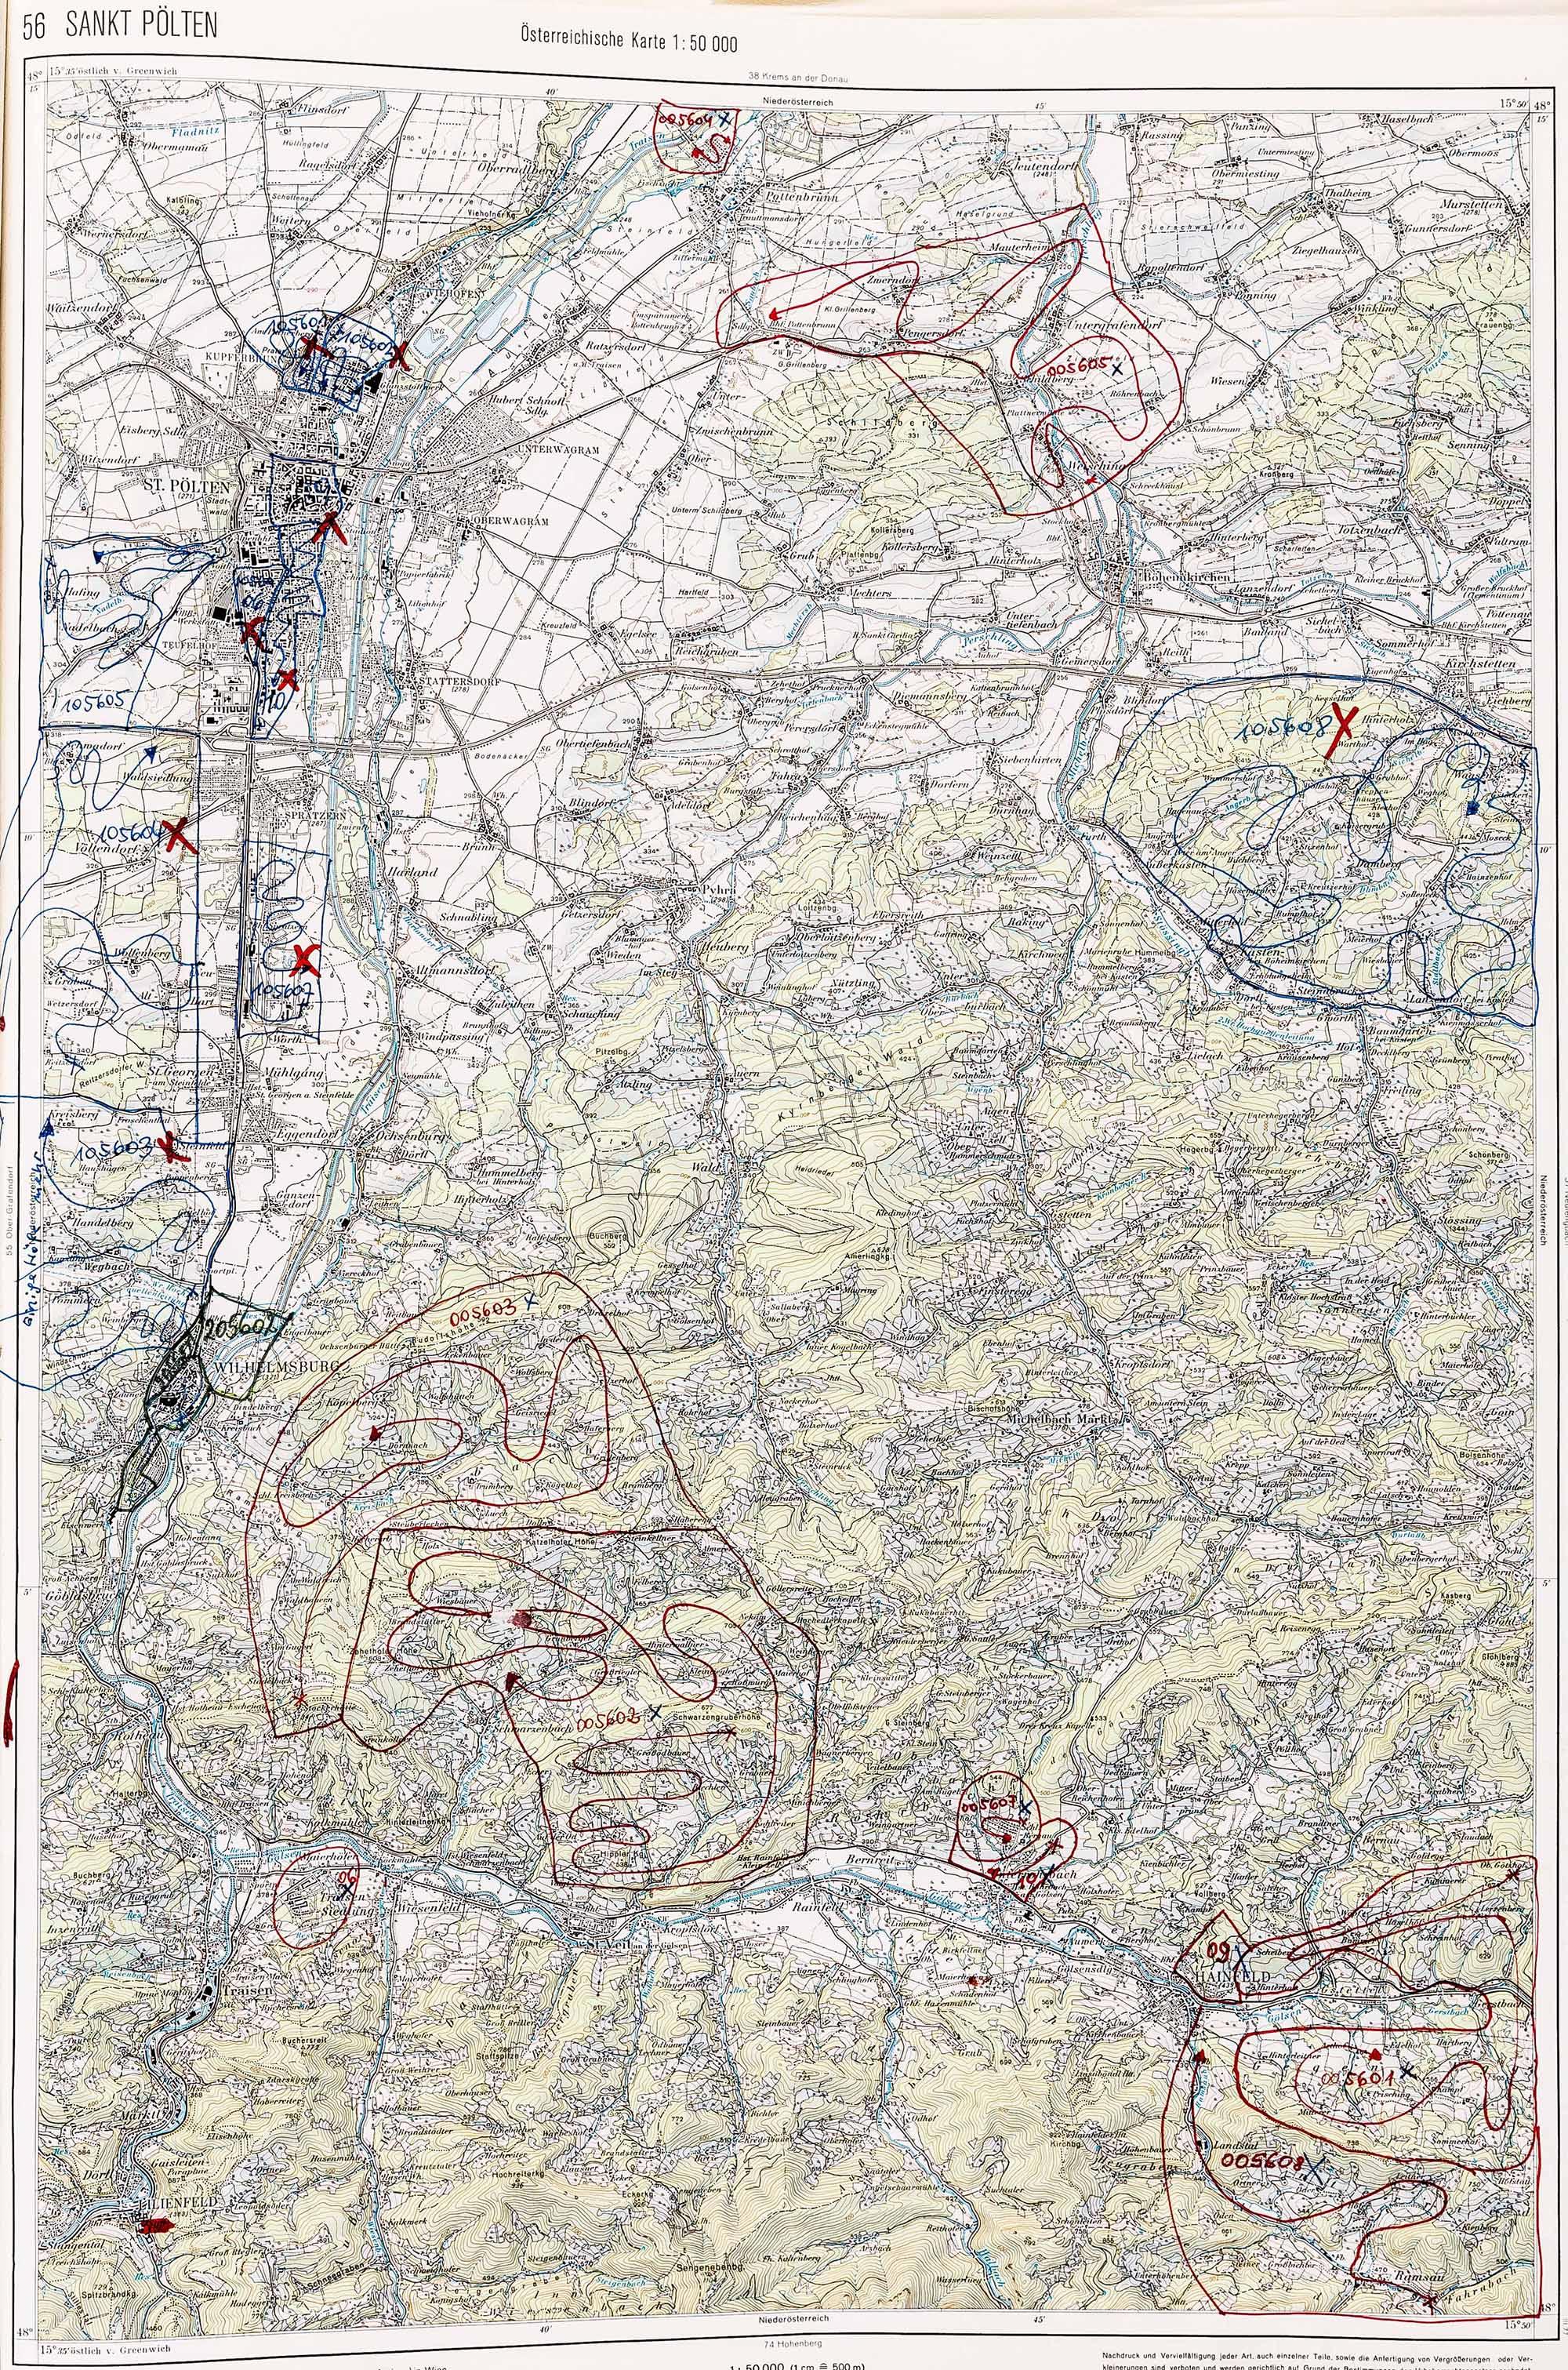 1979-1982 Karte 056